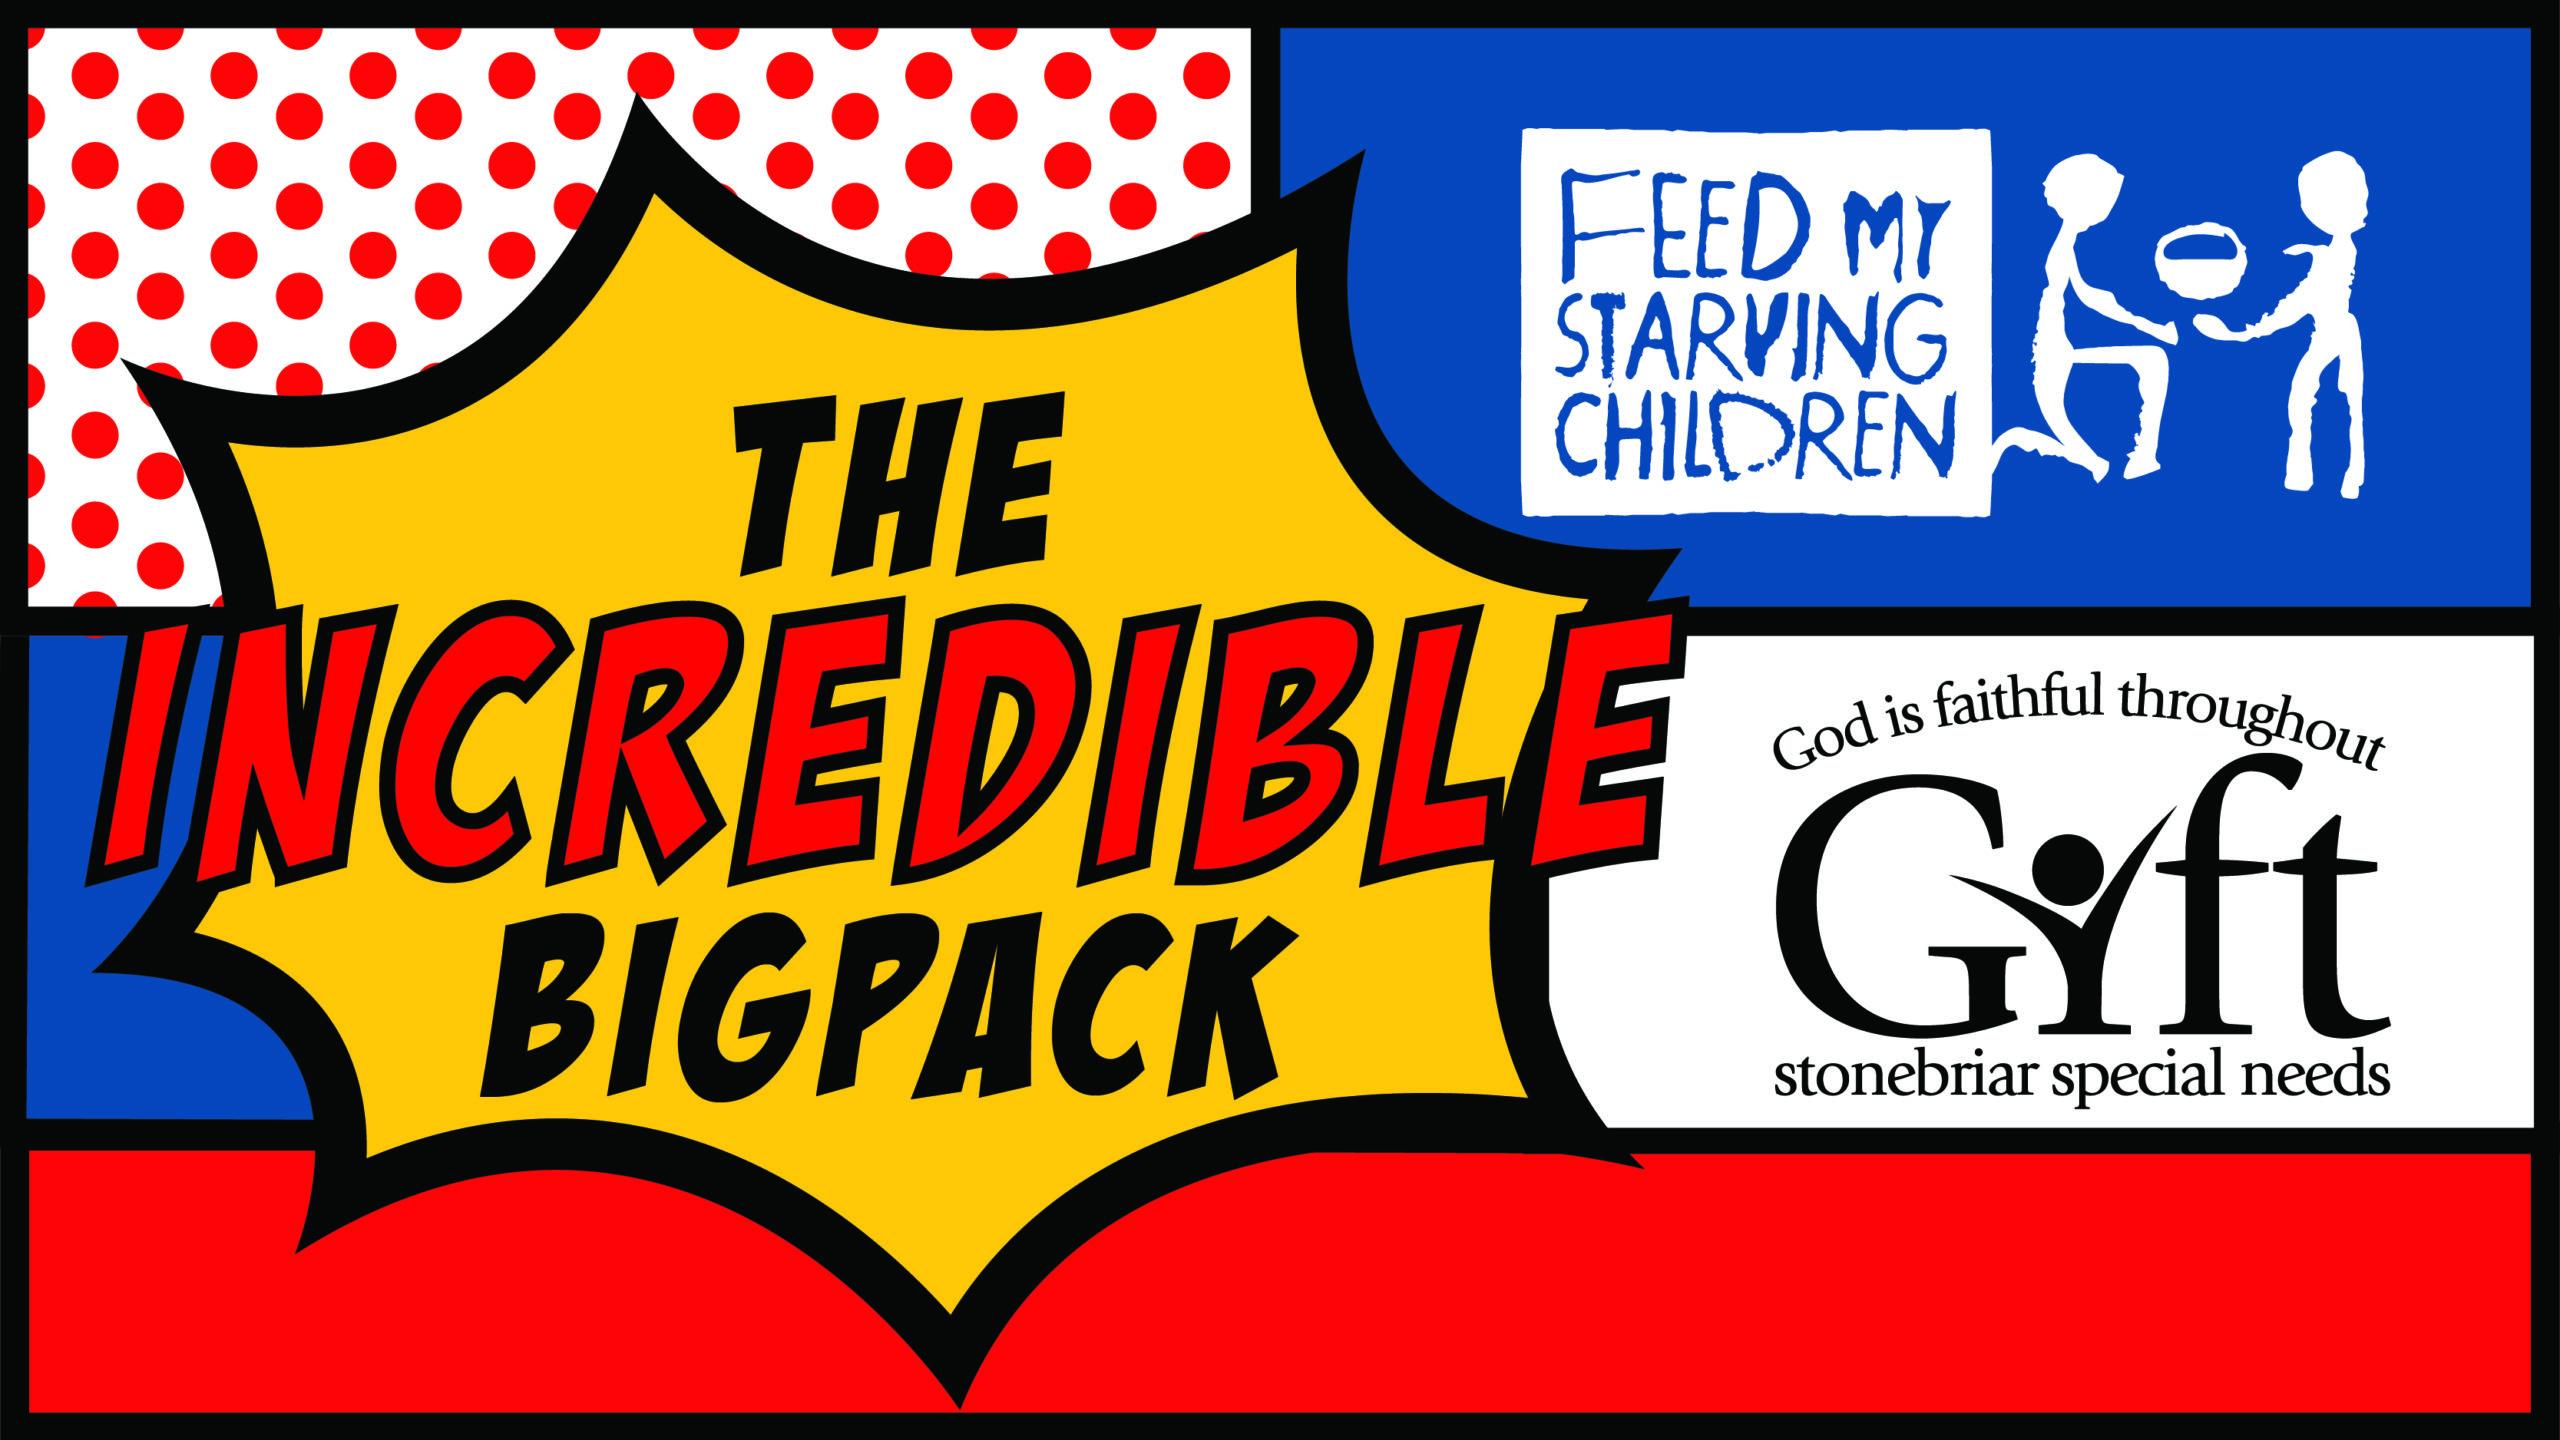 The Incredible Bigpack